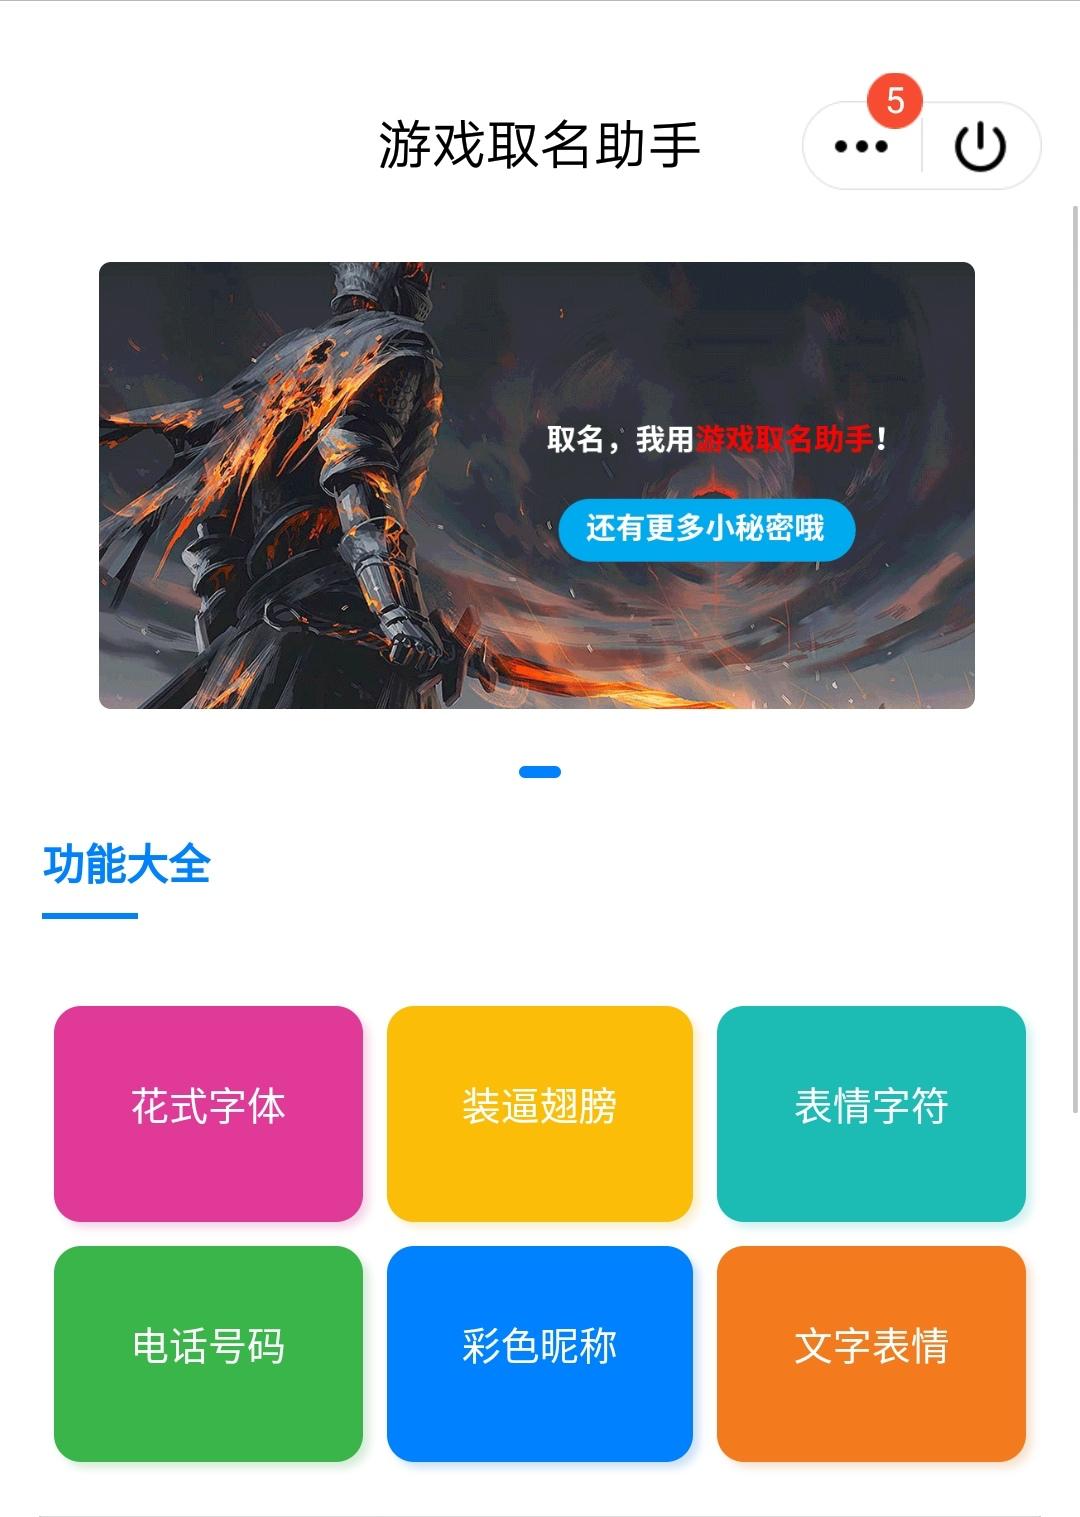 【QQ小程序】游戏取名助手